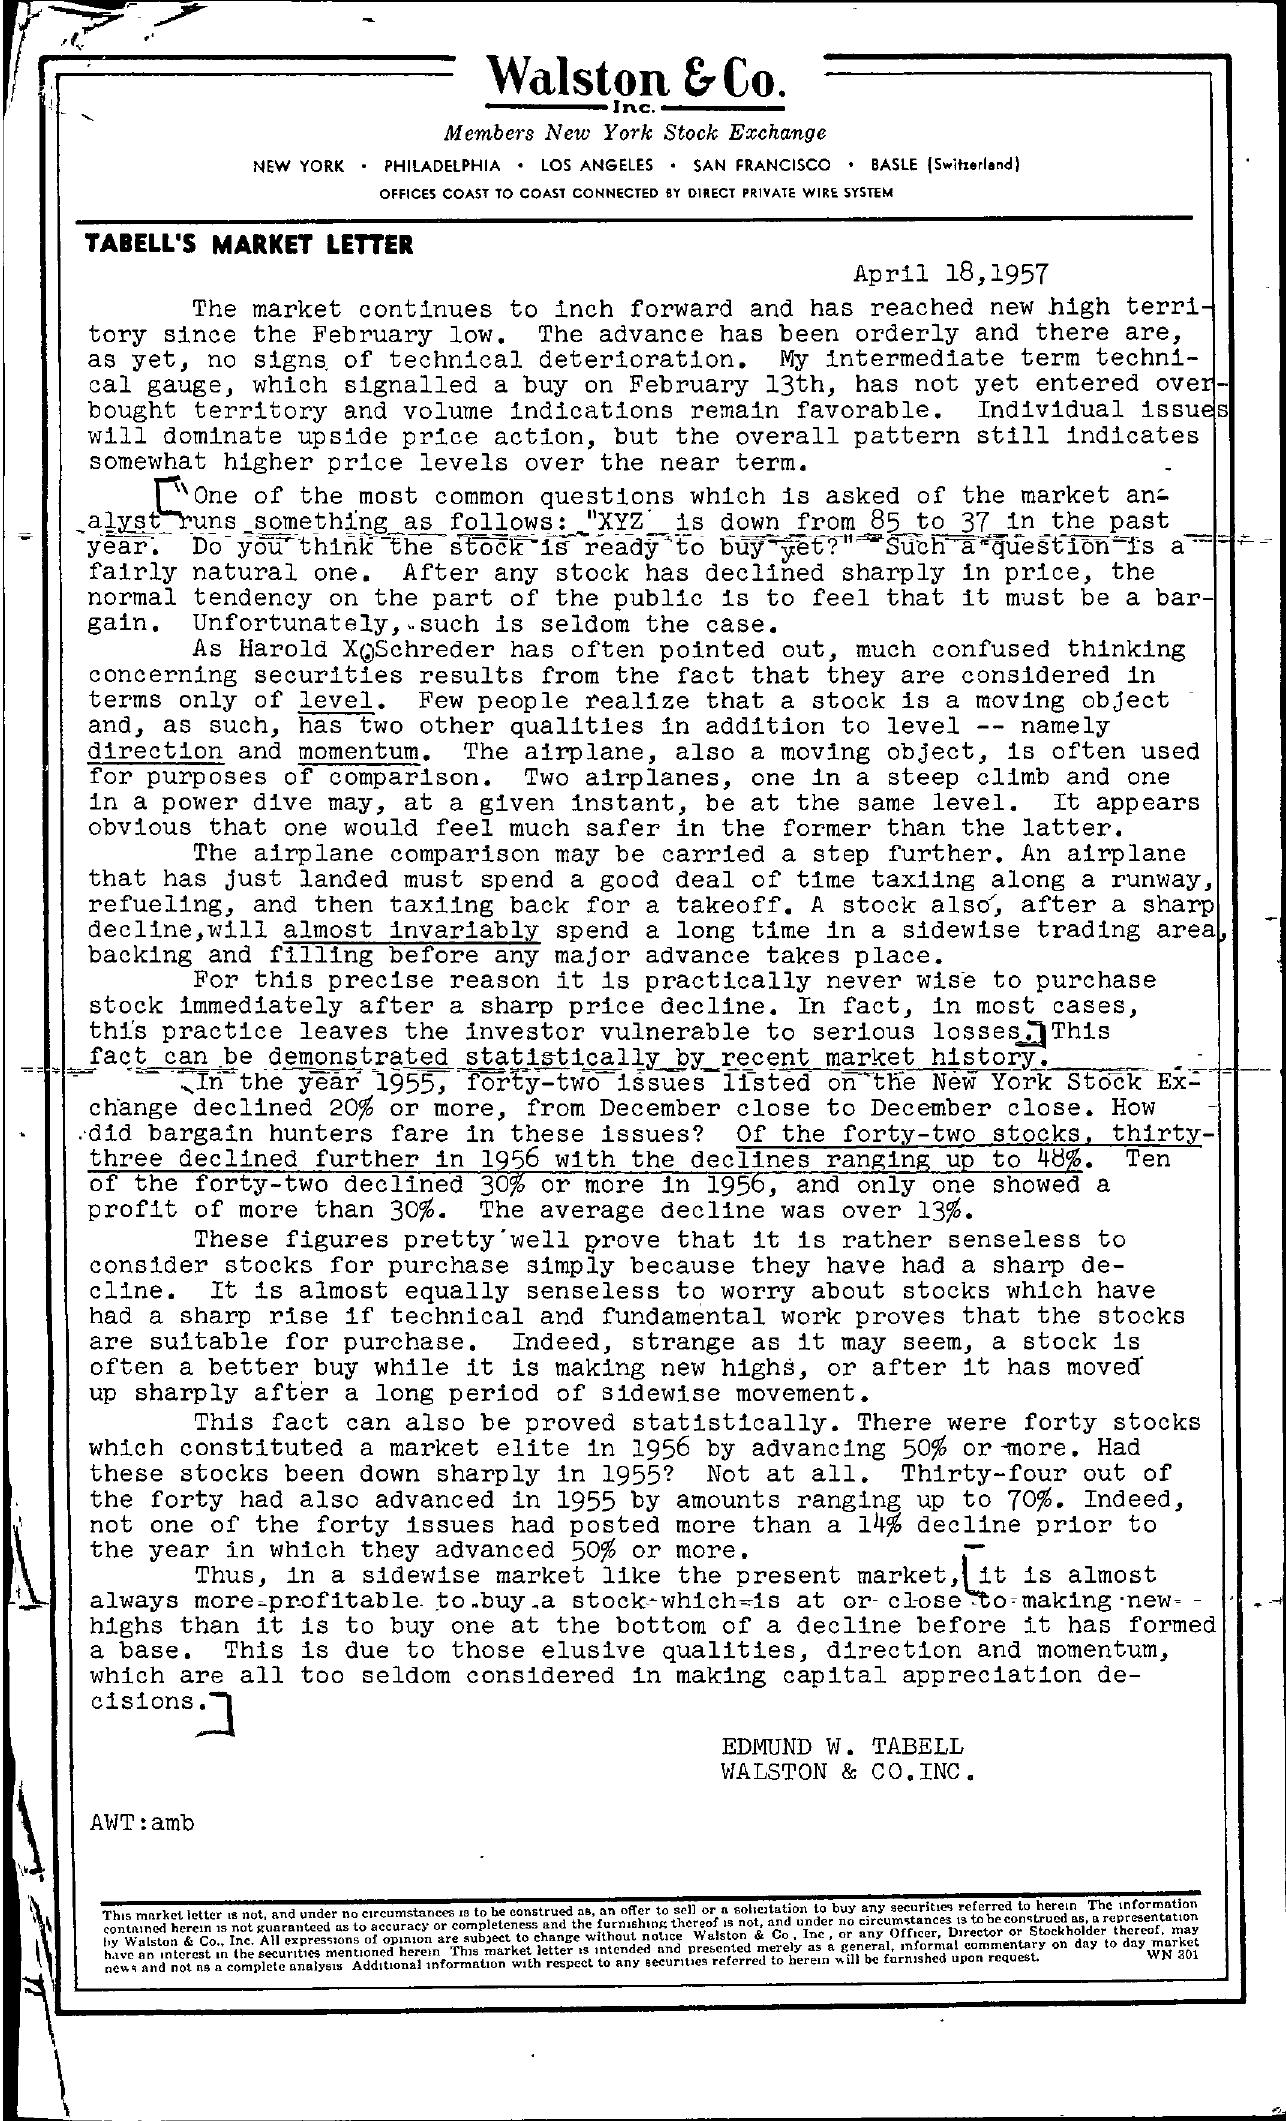 Tabell's Market Letter - April 18, 1957